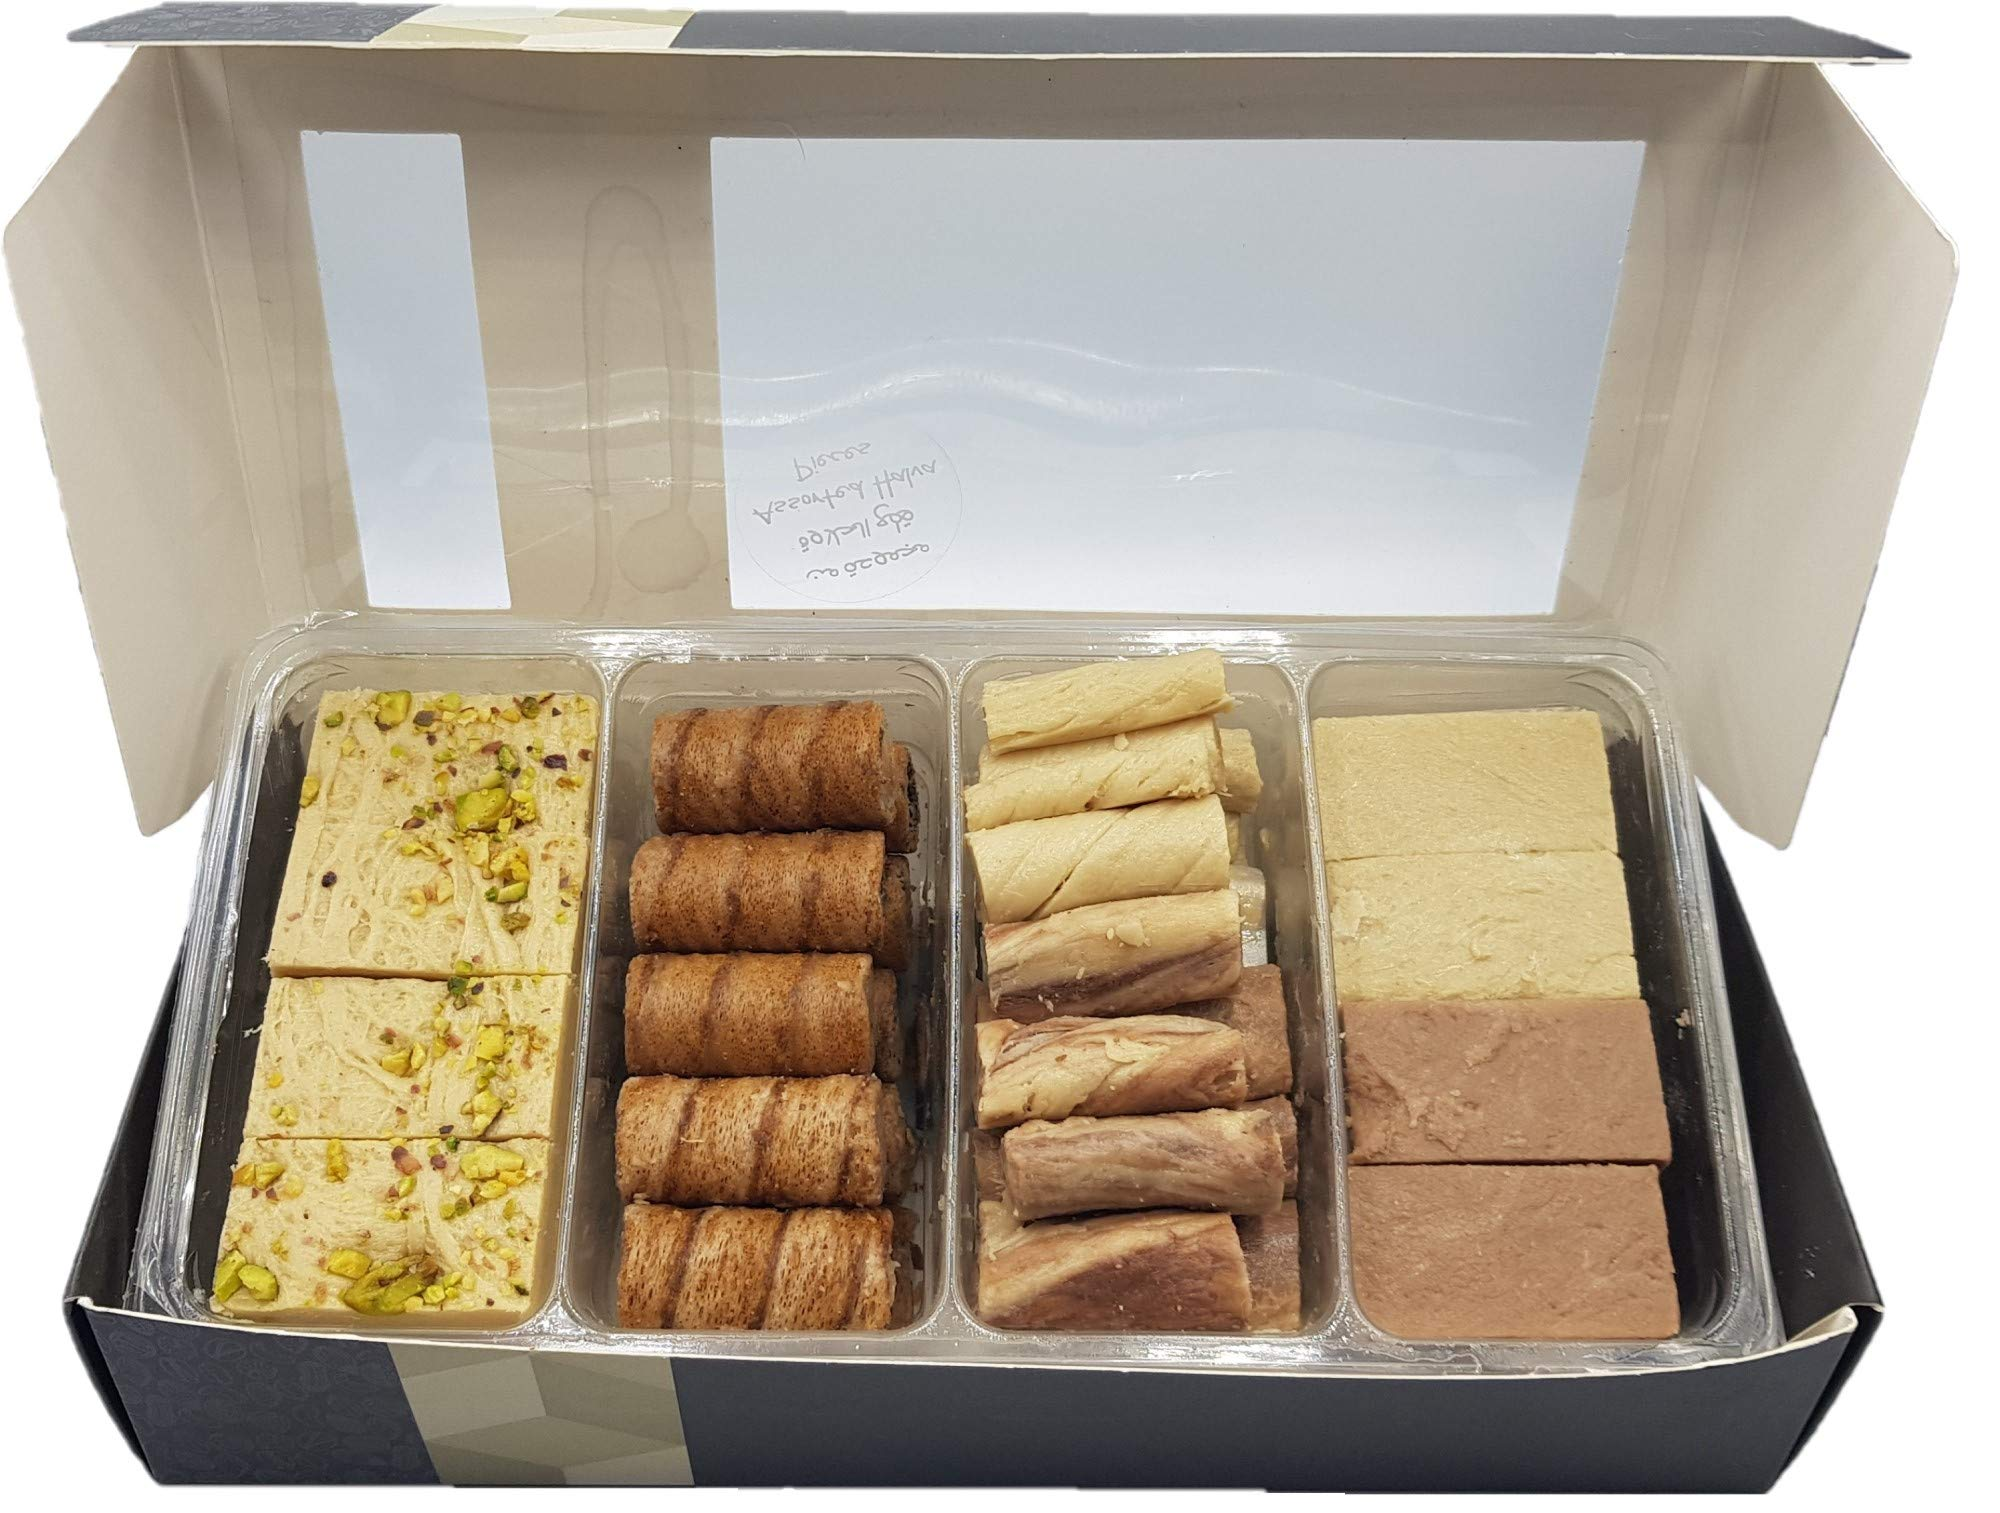 Artisanal Halvah Bars Assorted - 5 Varieties: Pistachio, Marble & Plain - Tahini Halvah Bars (1.8 lbs, 30 Oz, 800 Grams NET, 85-90 Pcs, 4 Layers) Halawa - Flaky Turkish Halva Very Classy Box by Turkish Delight